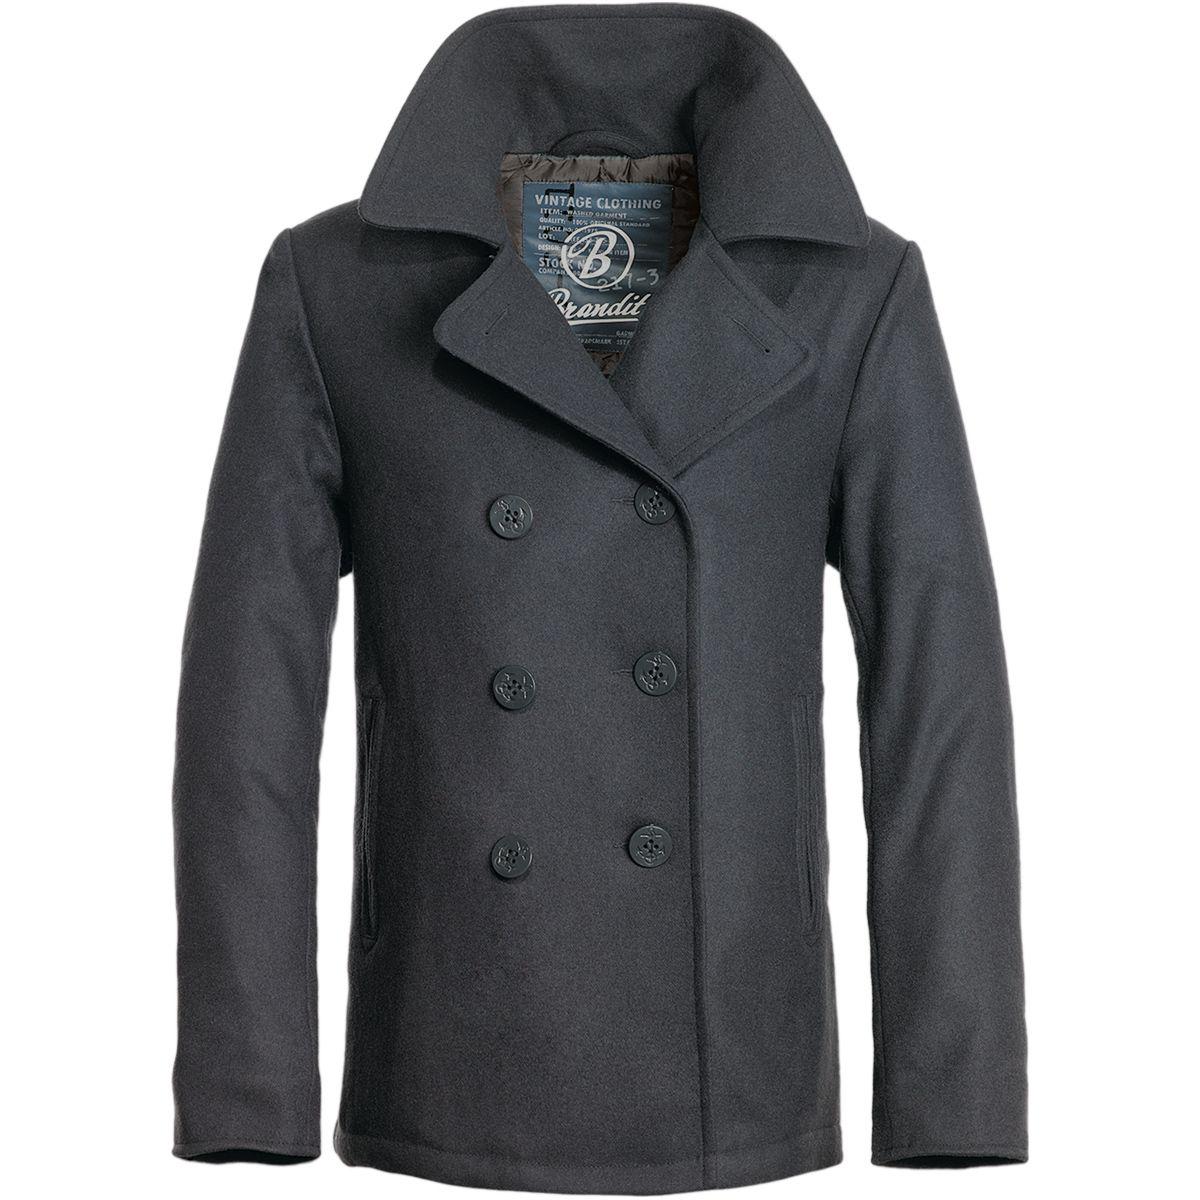 Brandit classic navy pea coat warm mens wool reefer travel jacket ...